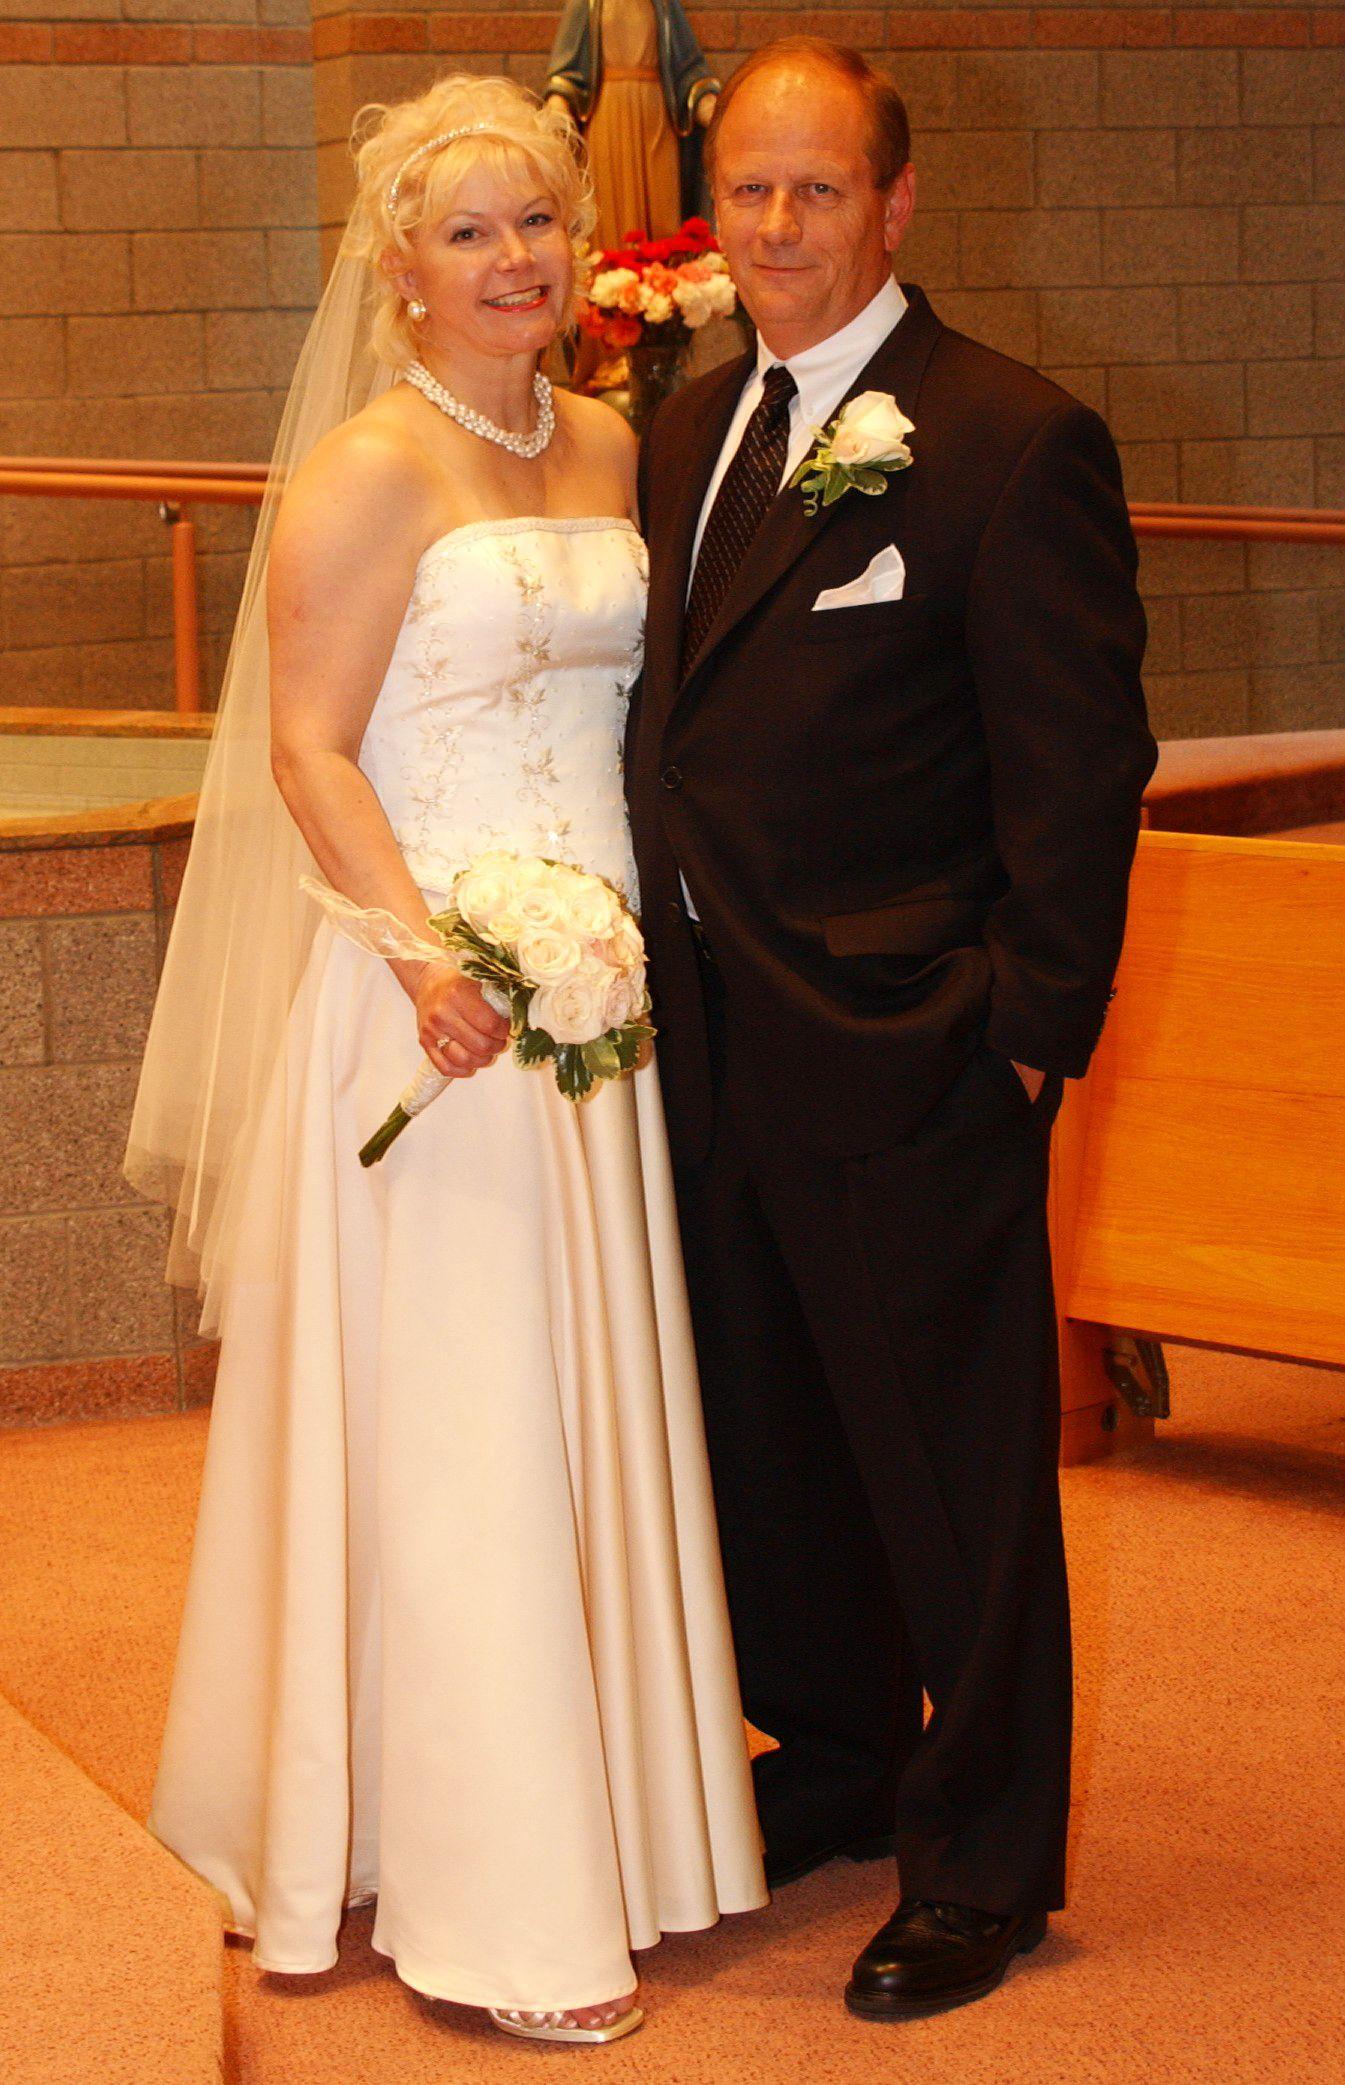 Wedding Dresses for Older Women | Wedding dress, Weddings and Woman